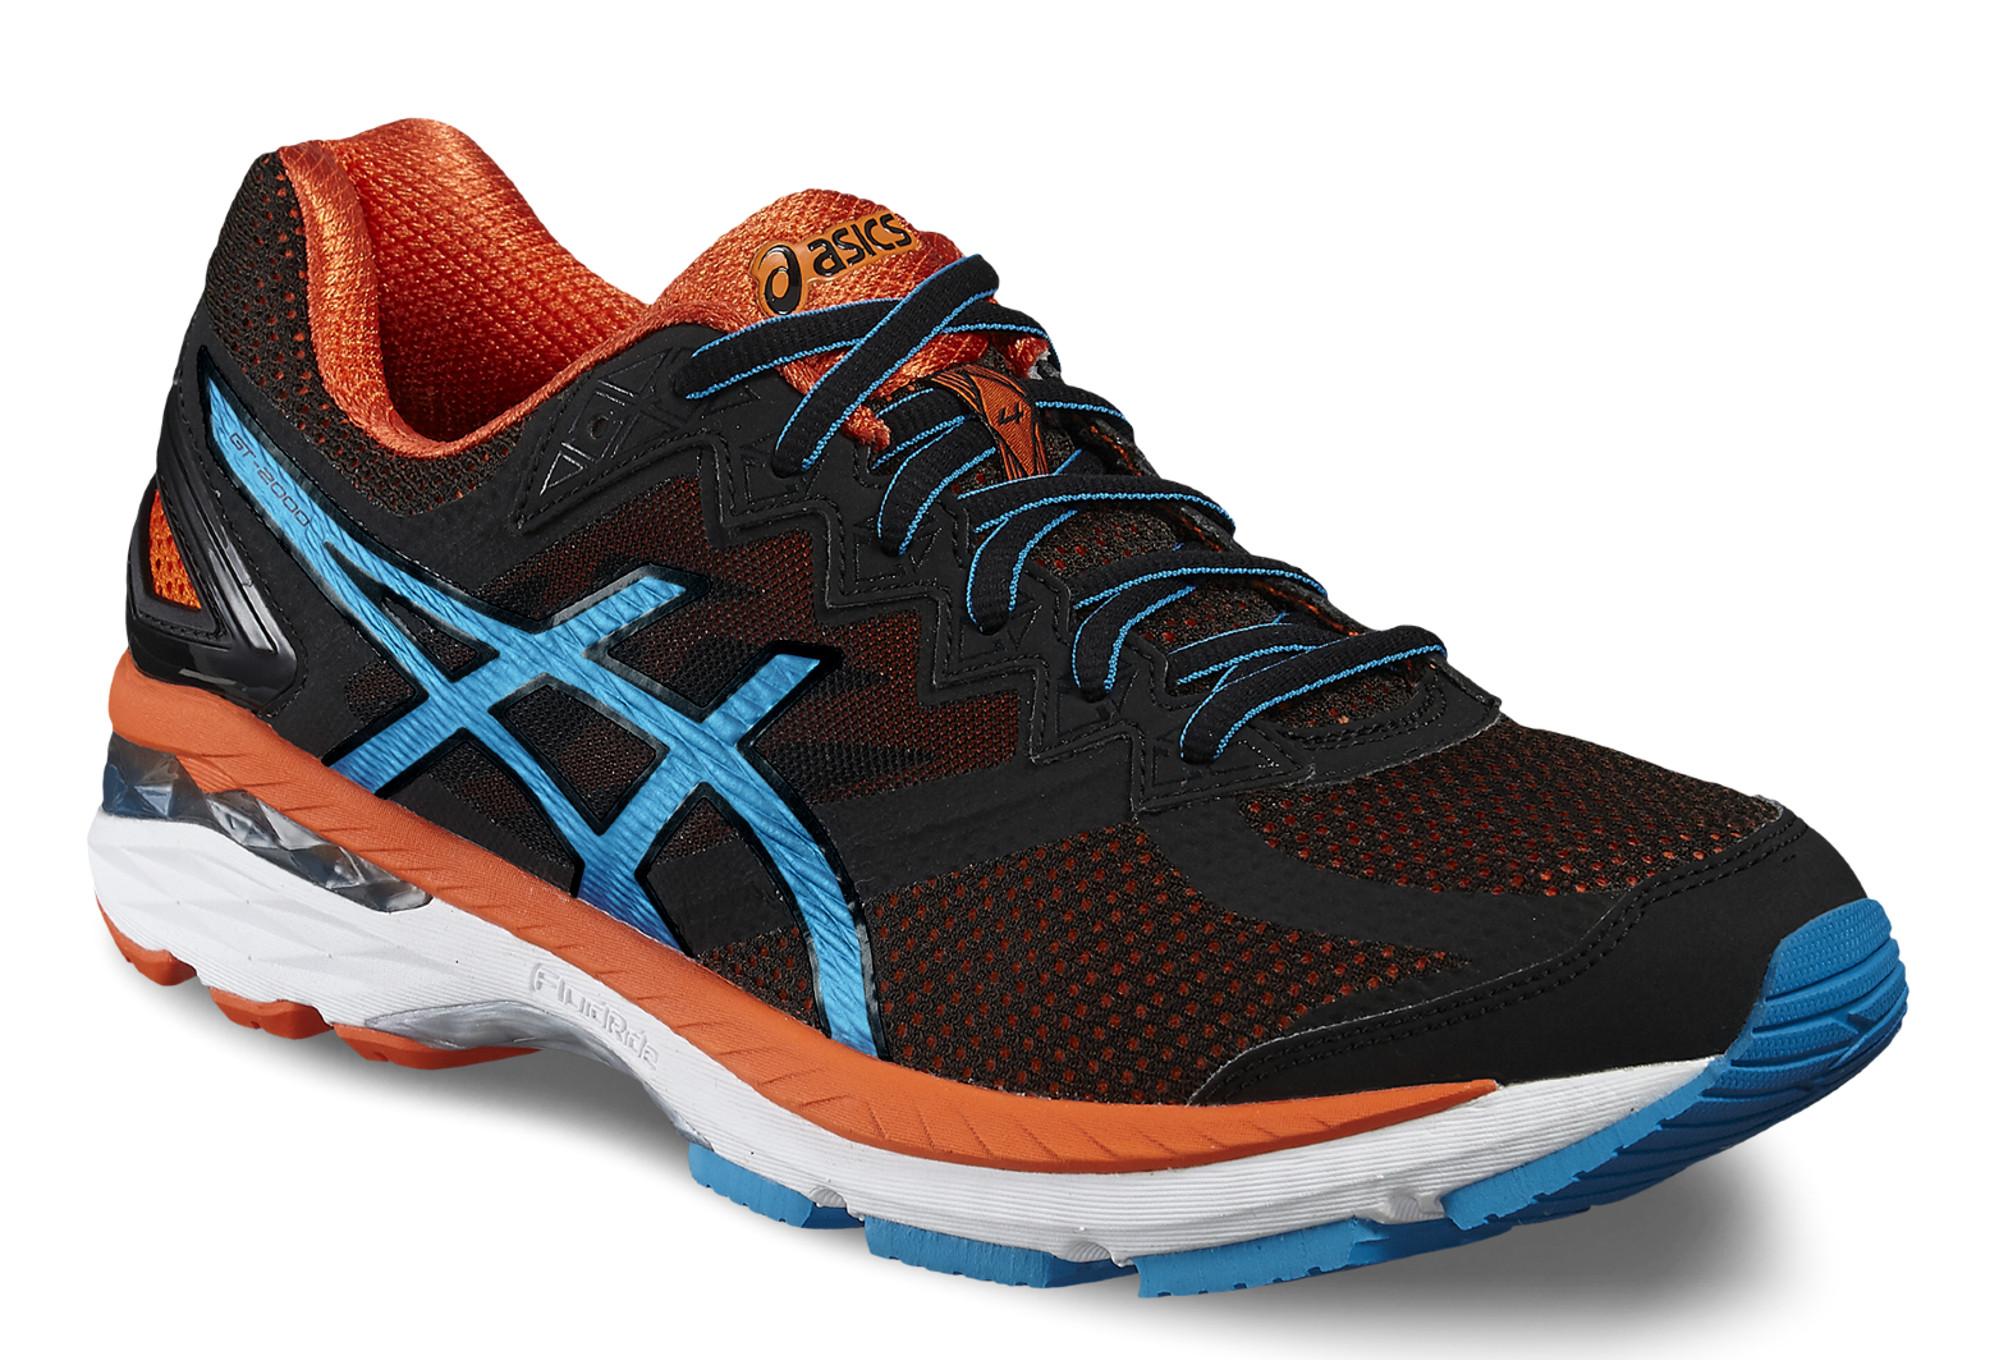 outlet store sale 2ed23 a3134 Chaussures de Running Asics GT 2000 4 Noir   Blanc   Orange